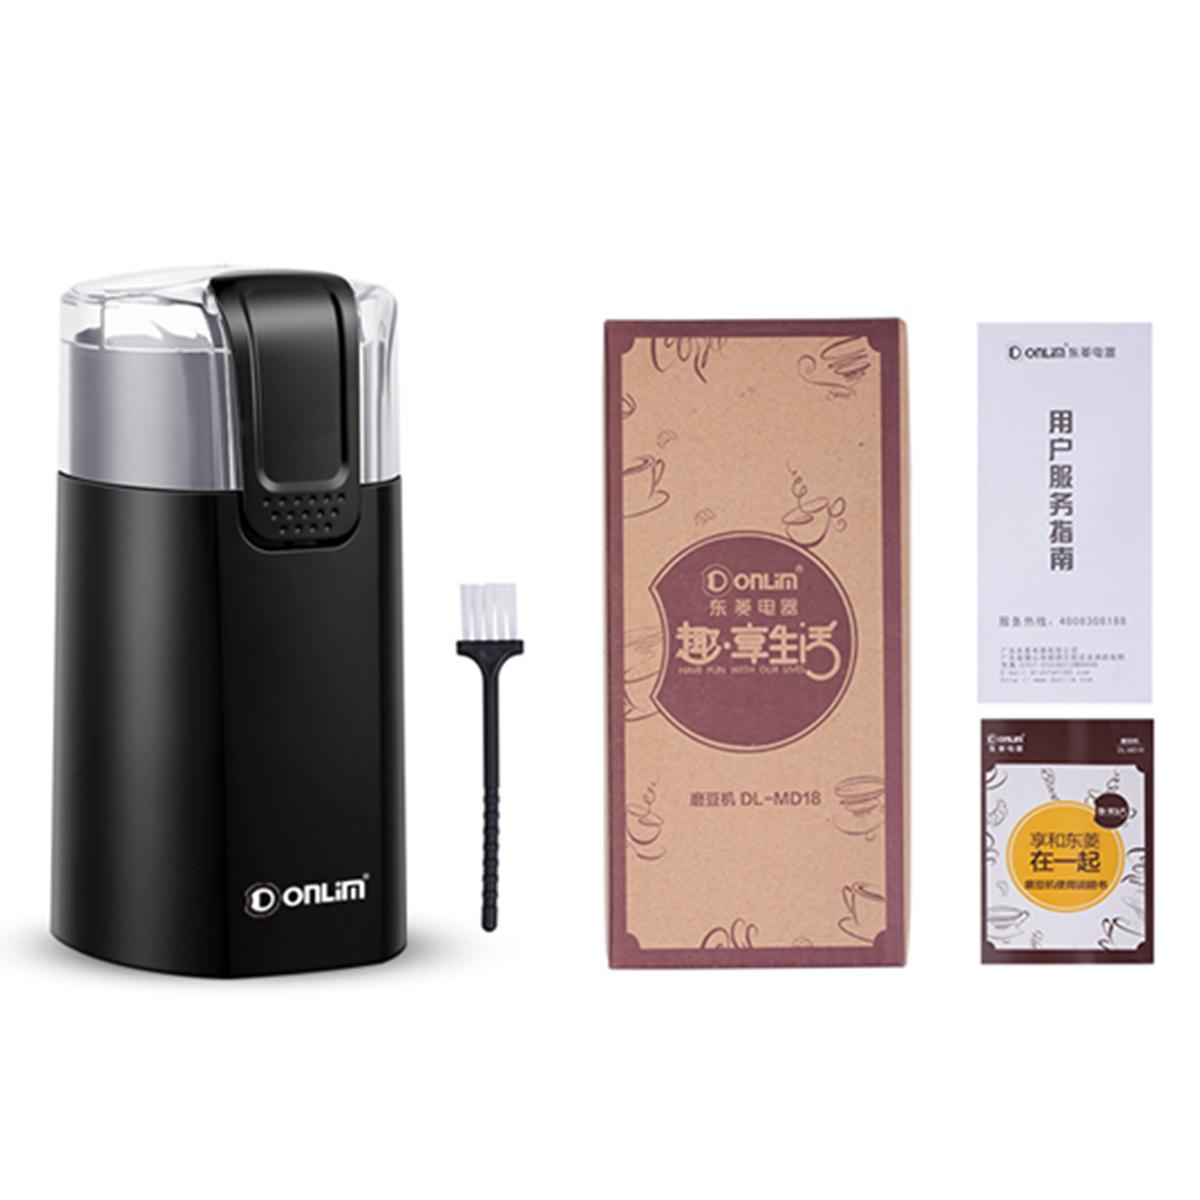 Donlim DL-MD18 Electric Stainless Steel Blade Coffee Bean Nut Grinder Grinding